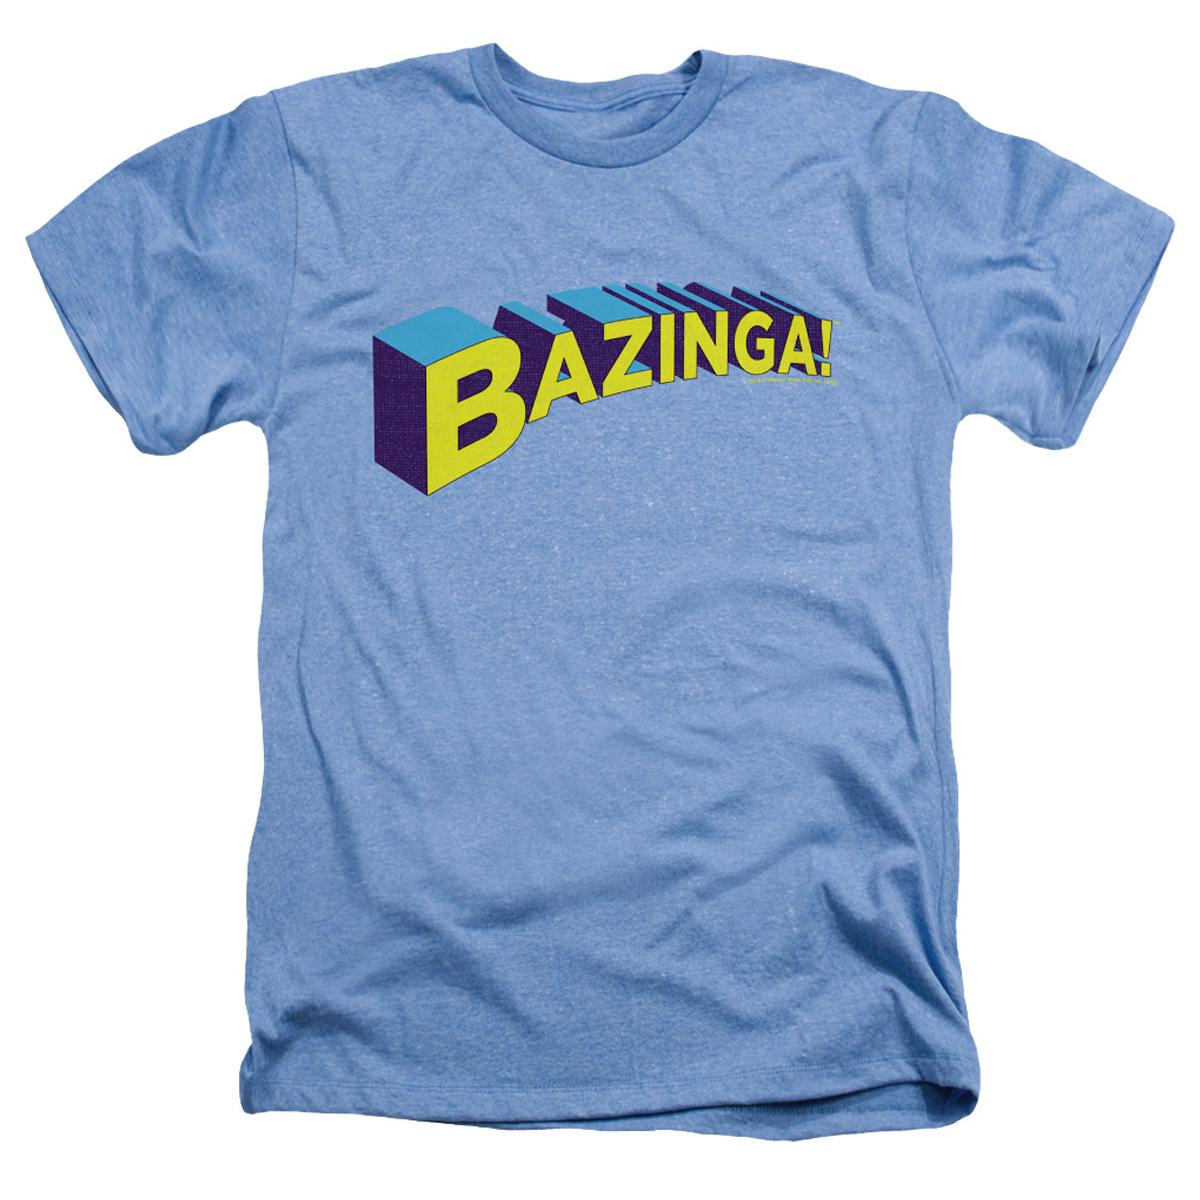 The Big Bang Theory Bazinga T-Shirt (Light Blue)